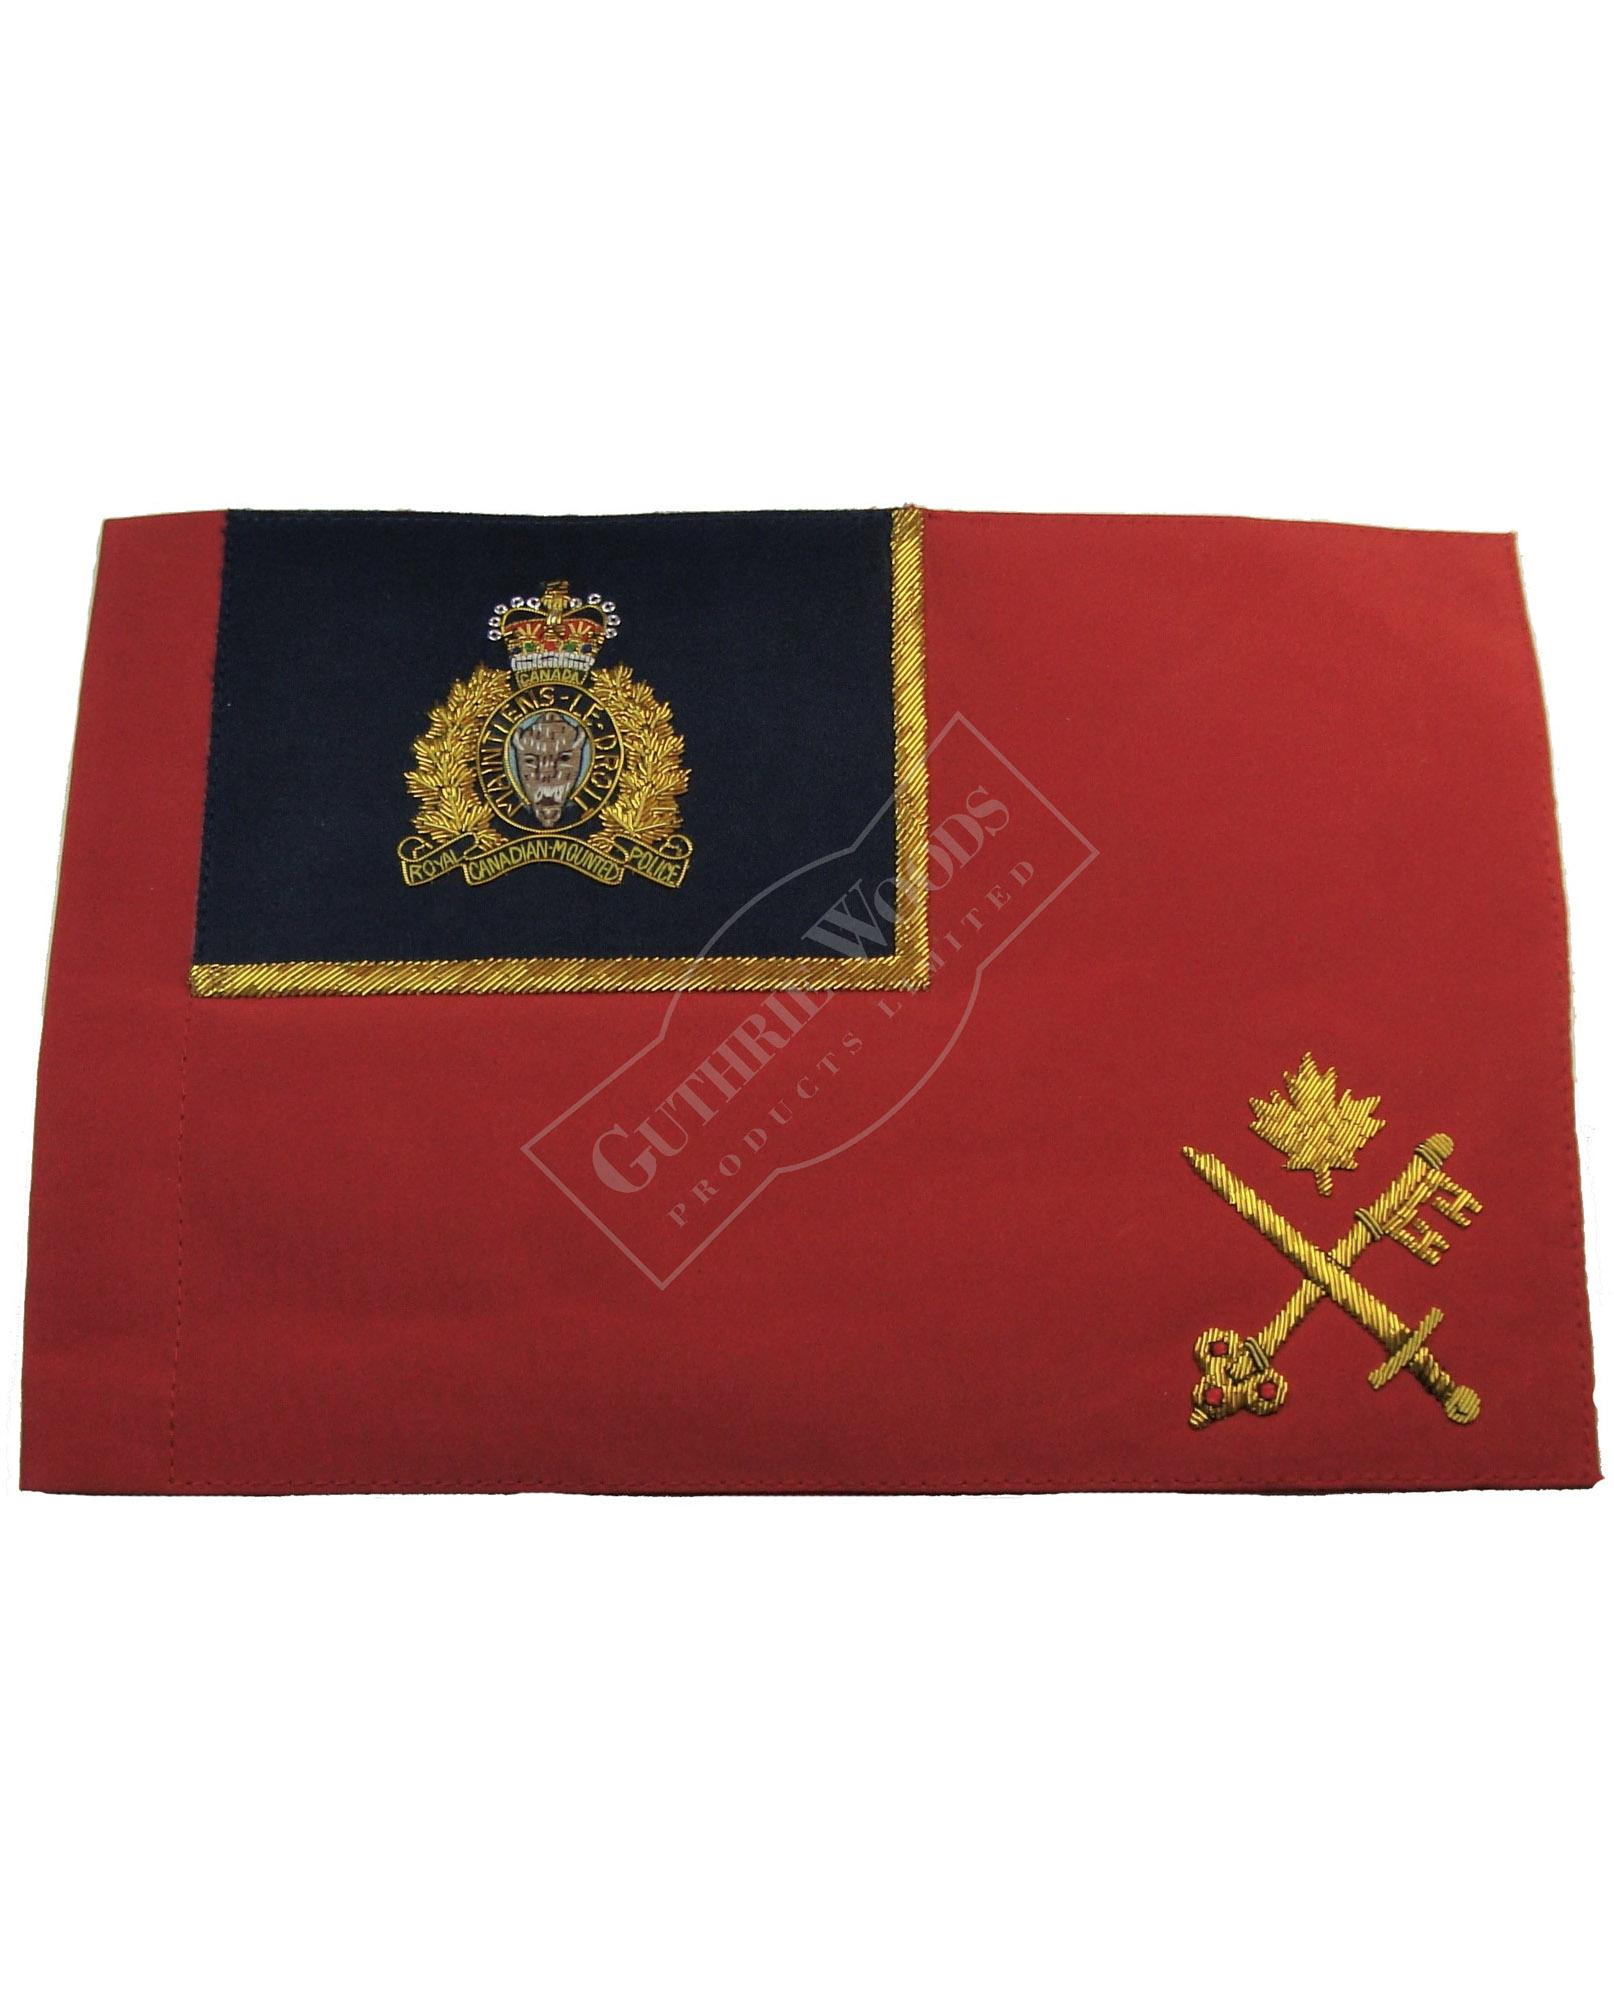 RCMP Miniature Division Ensign R173-NATL